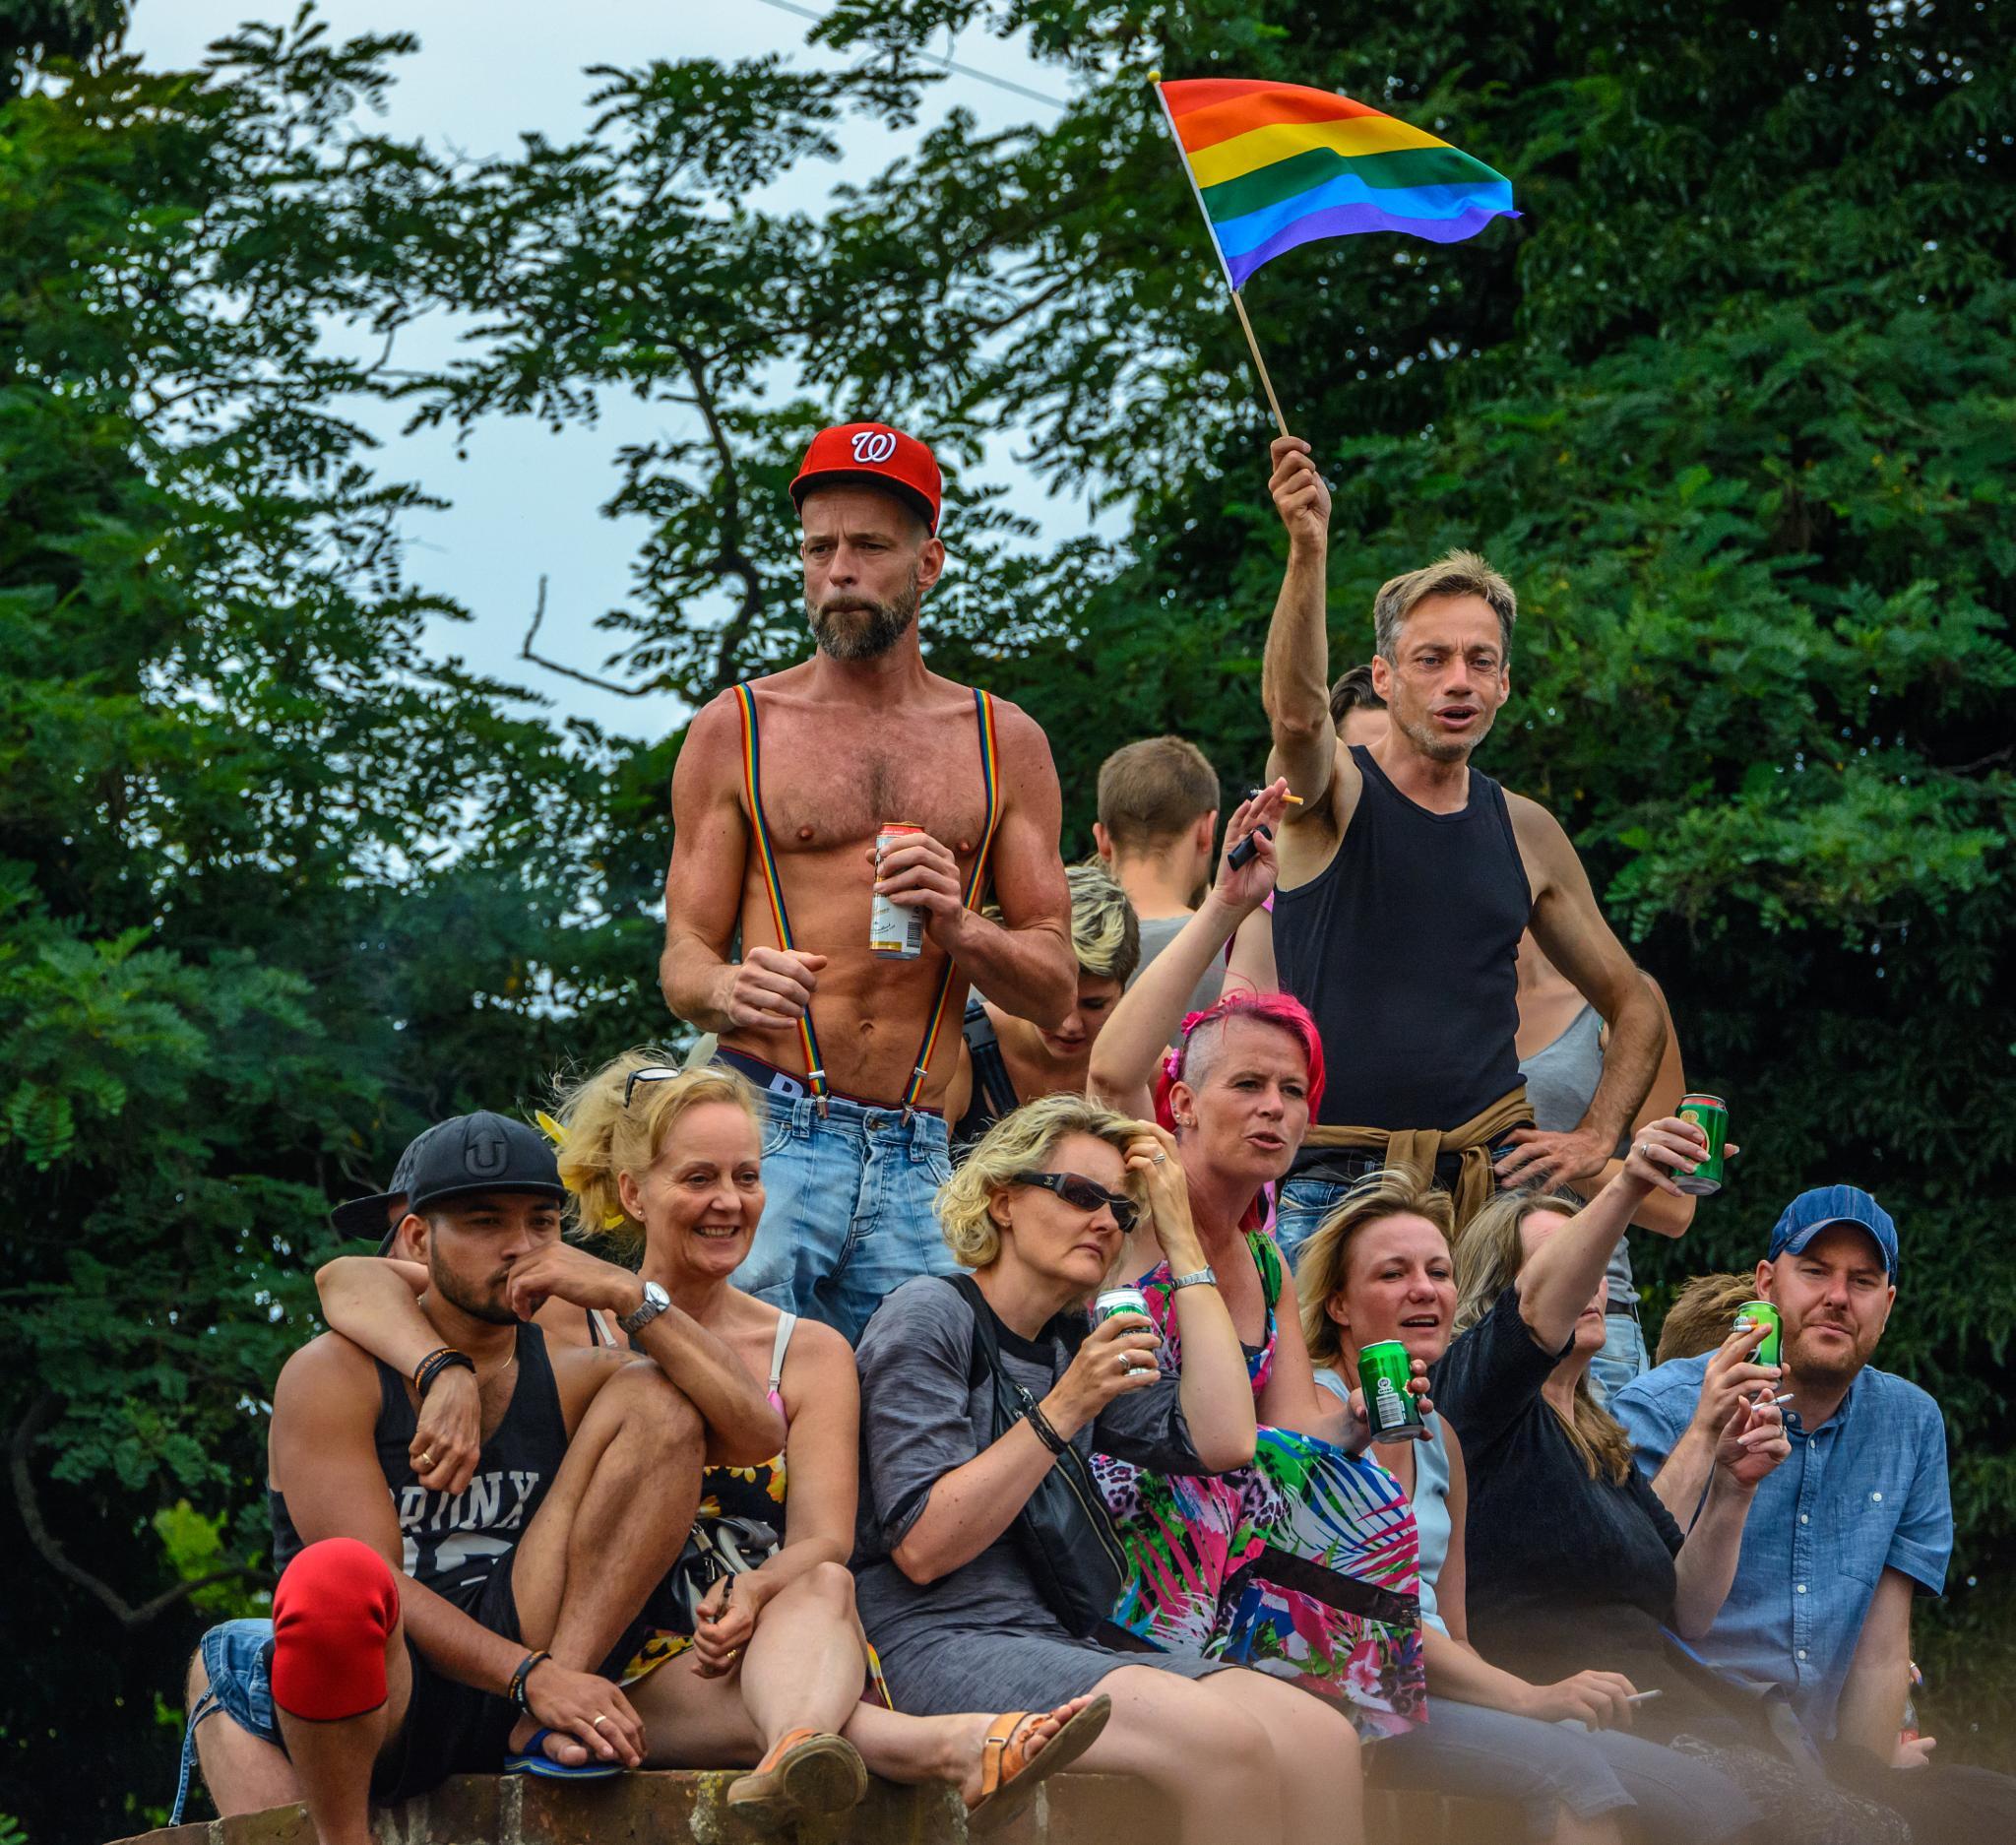 CopenhagenPride 2015 by Franke Gormadoc